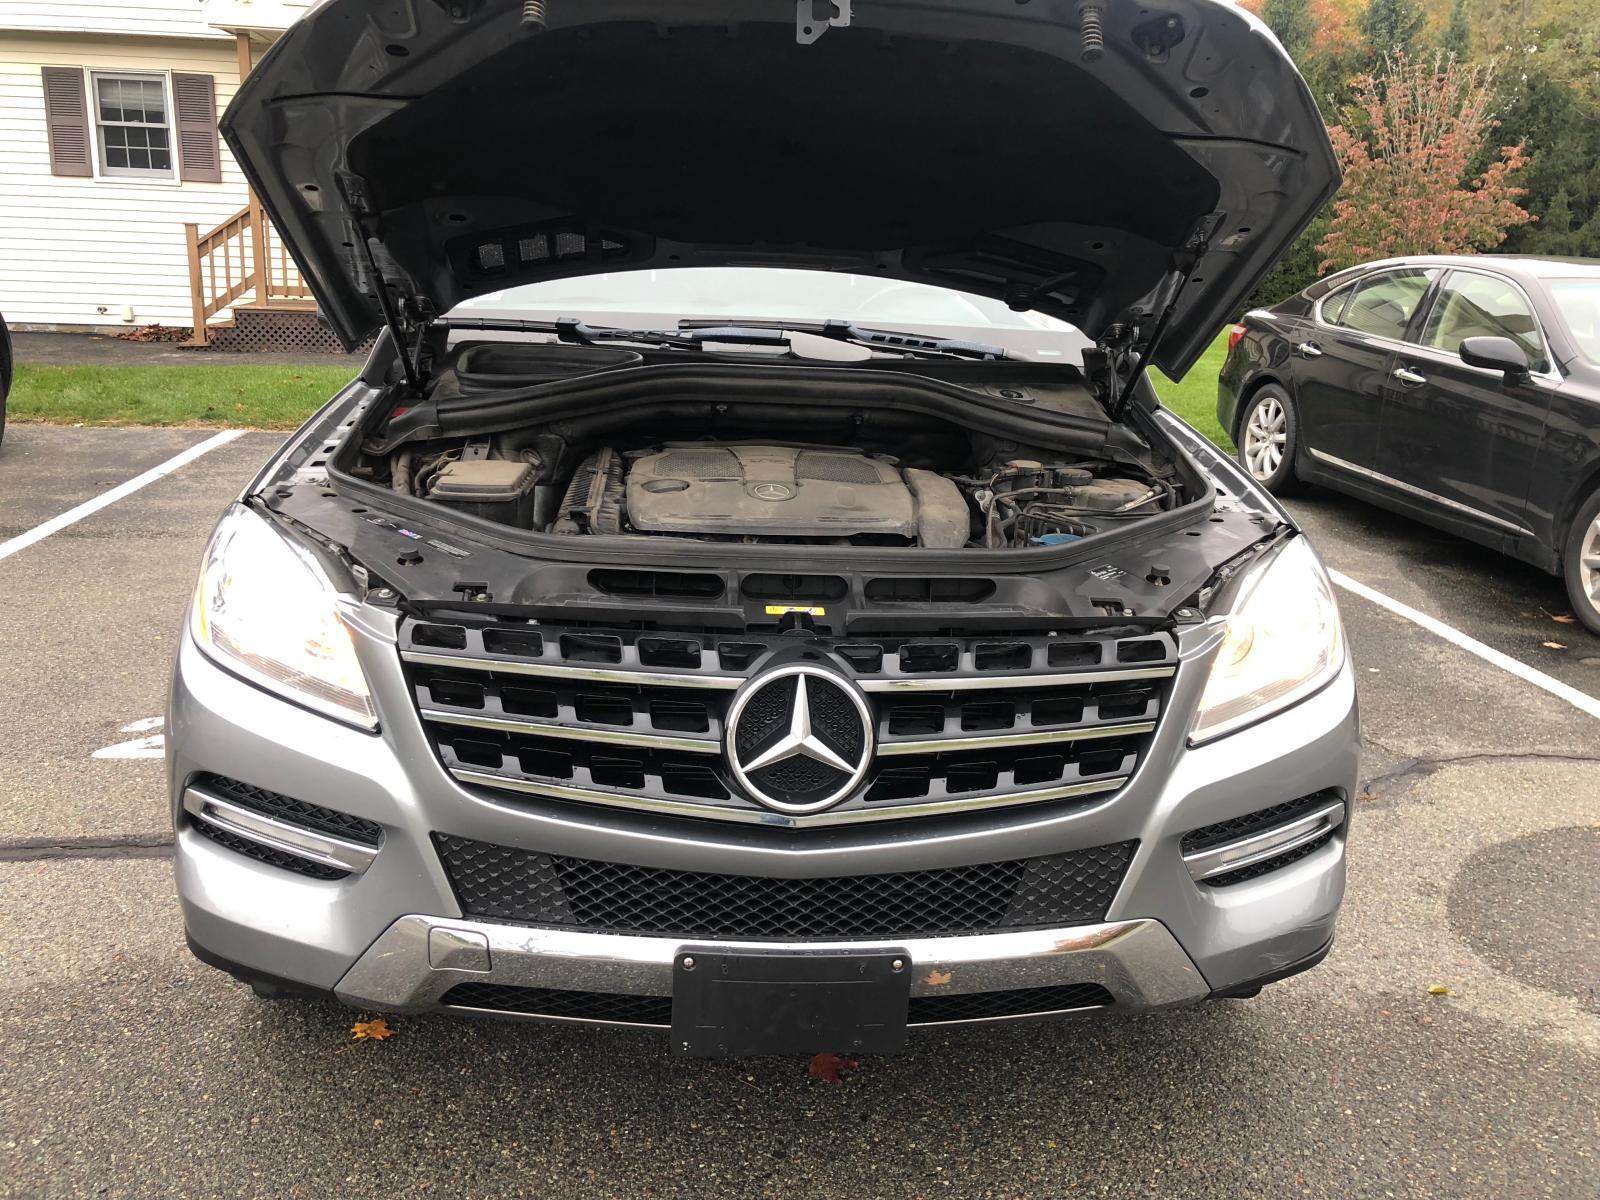 2012 Mercedes-Benz Ml 350 4Ma 3.5L front view